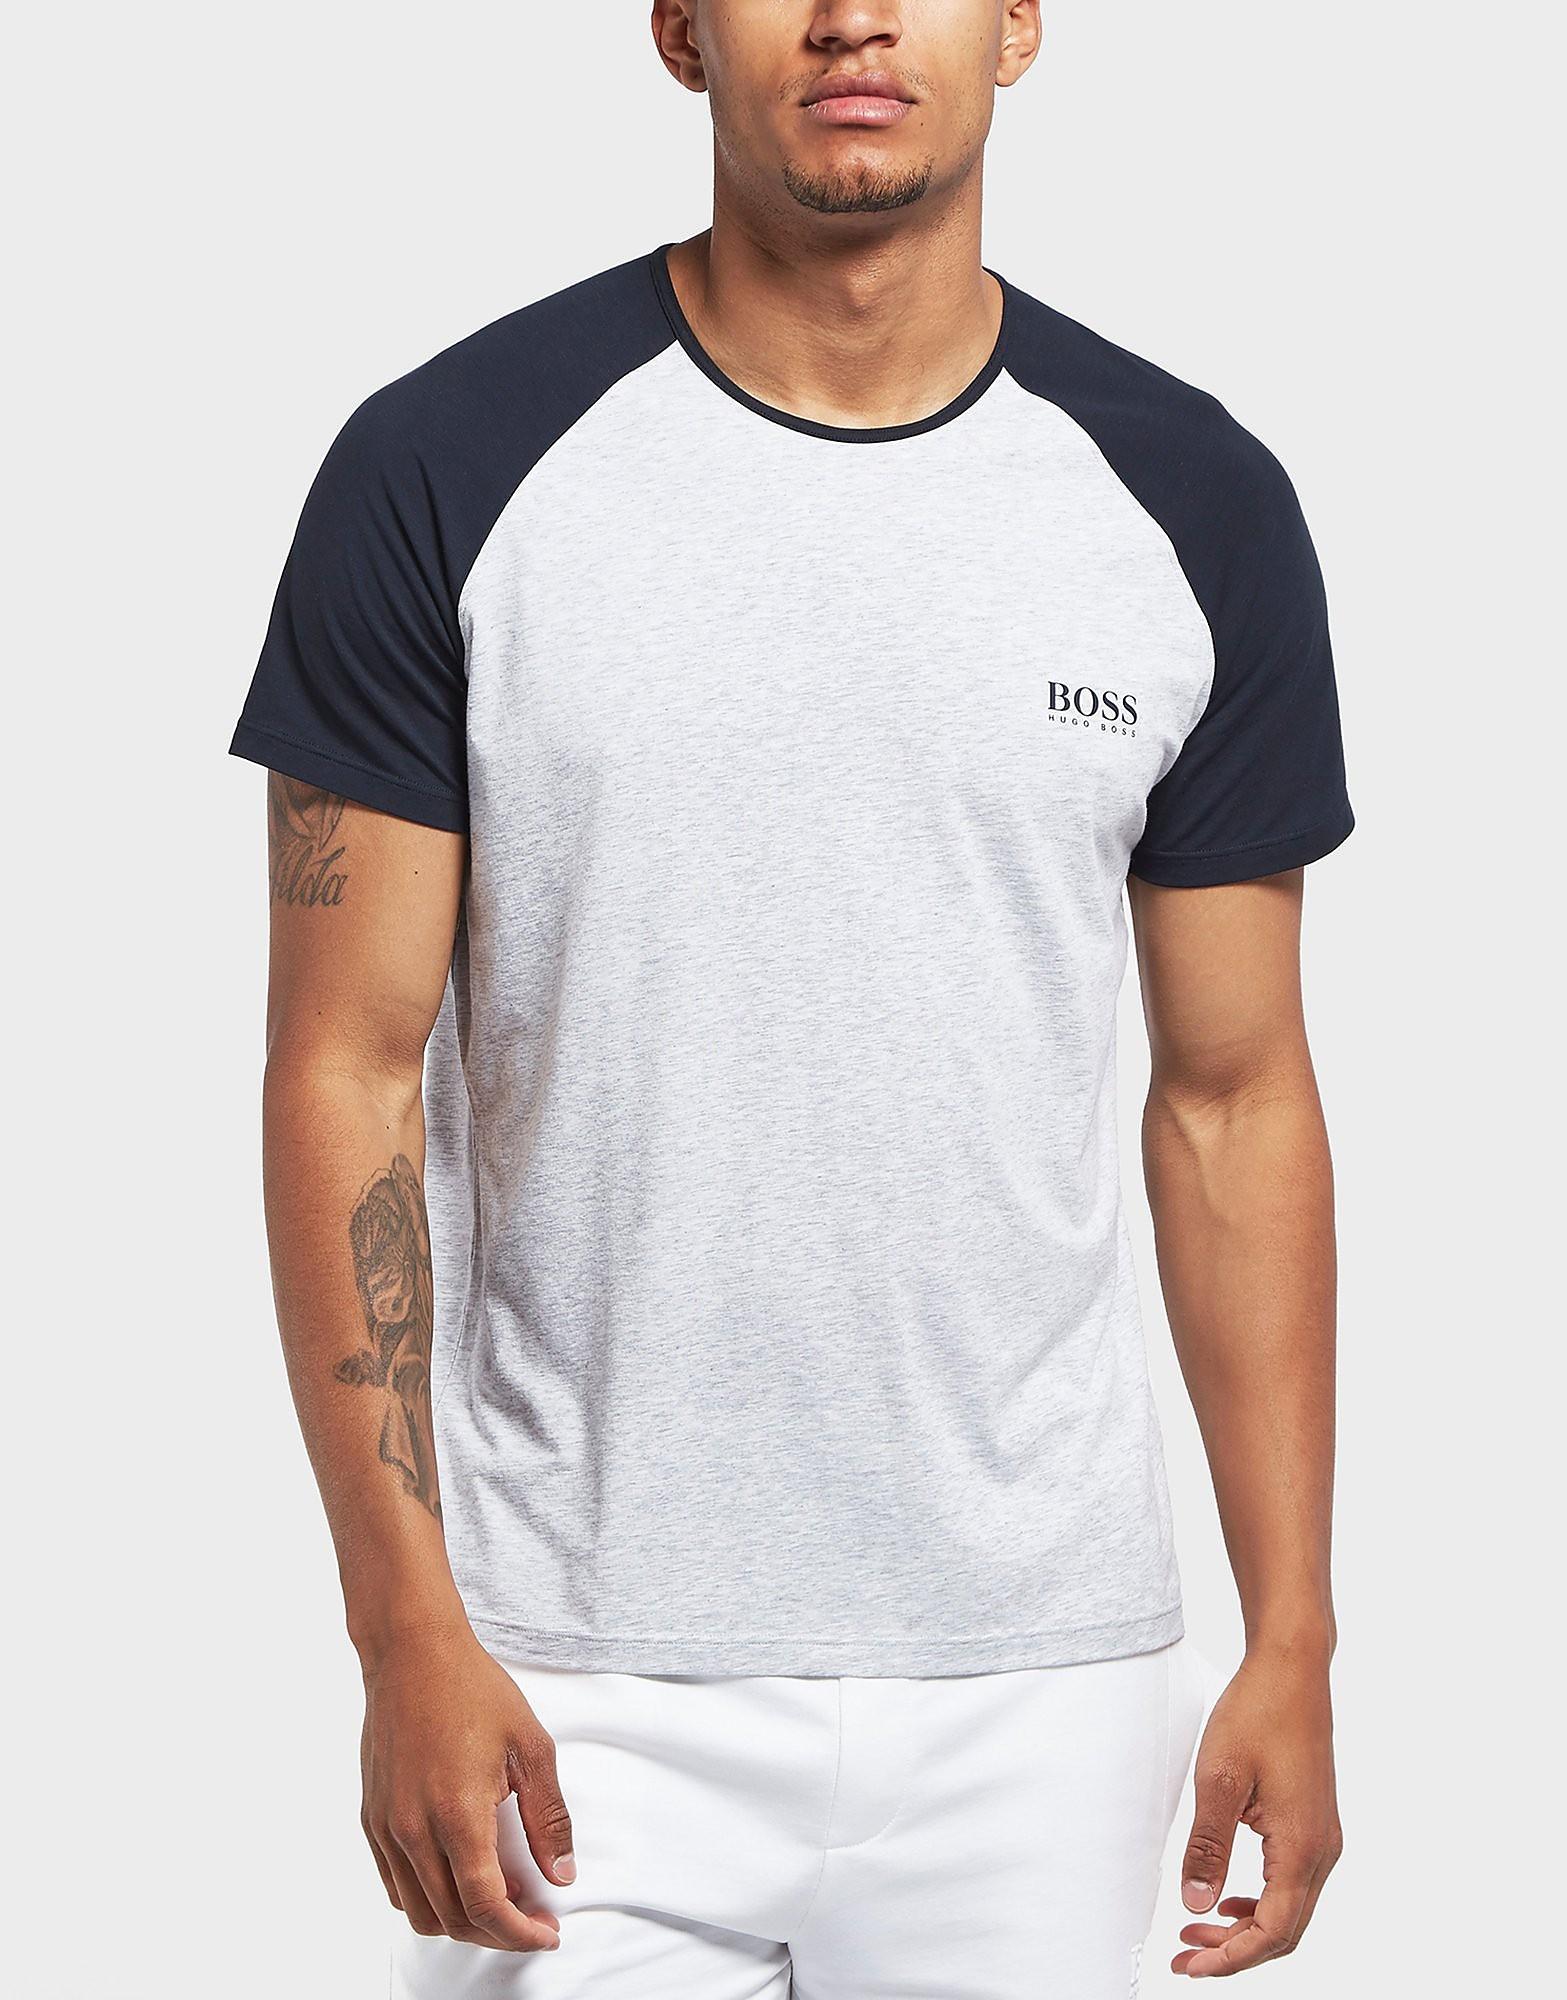 BOSS Raglan Stretch Short Sleeve T-Shirt